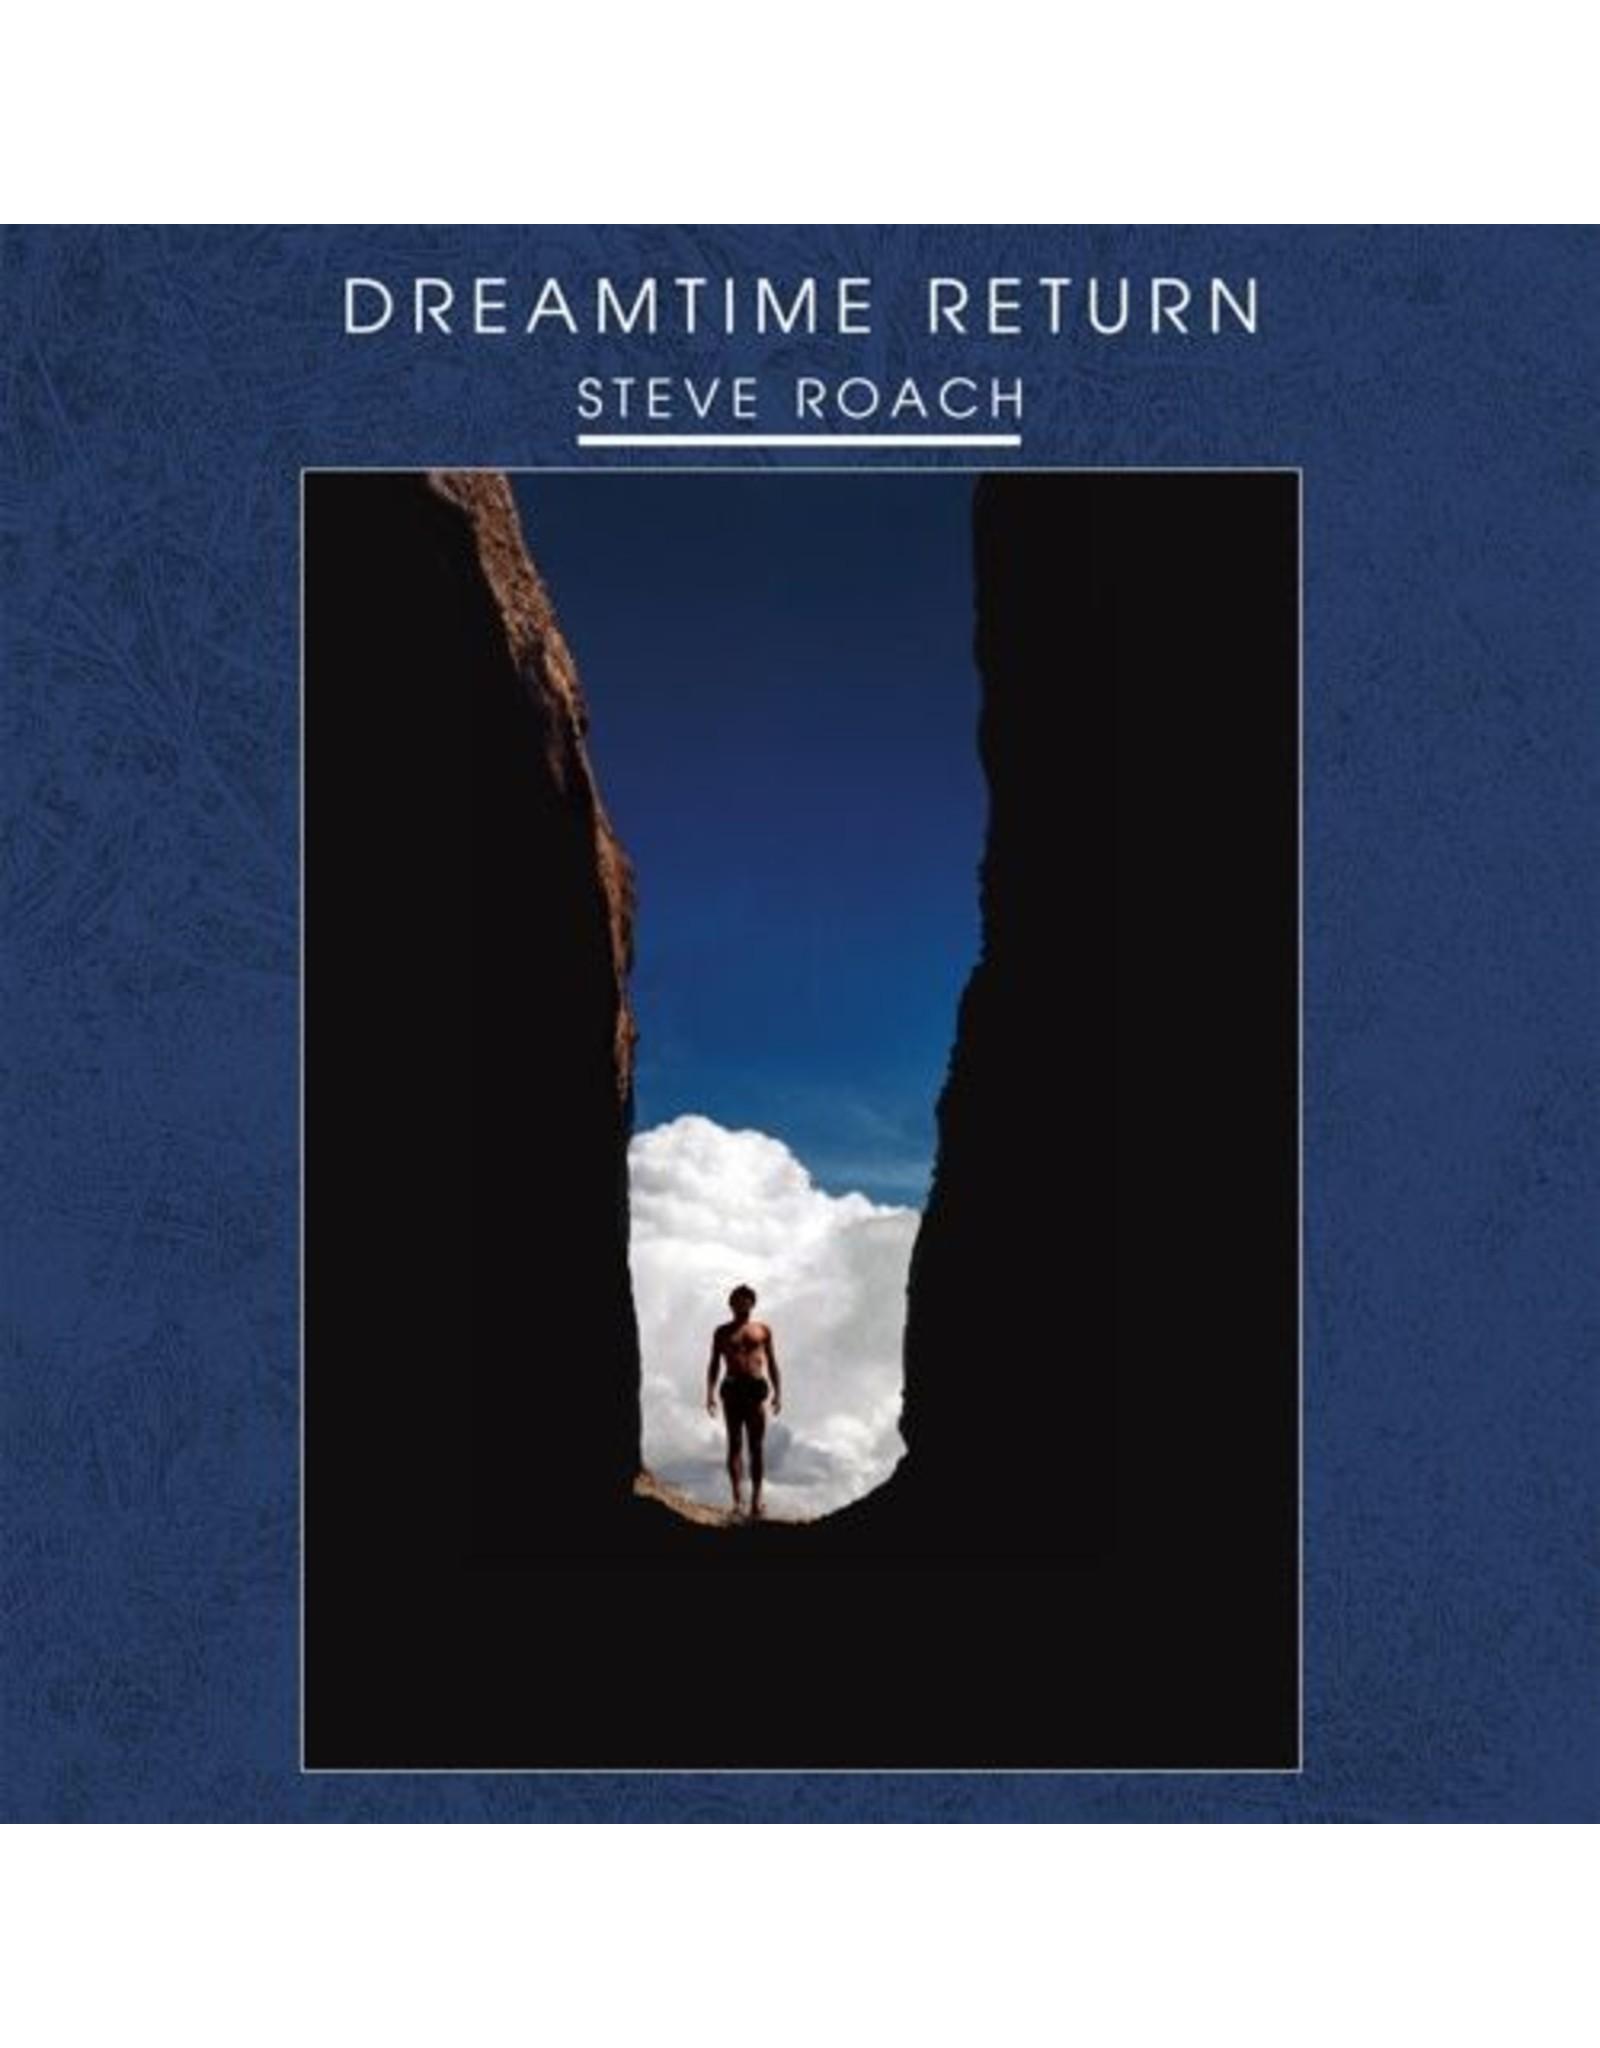 Telephone Explosion Roach, Steve: Dreamtime Return LP